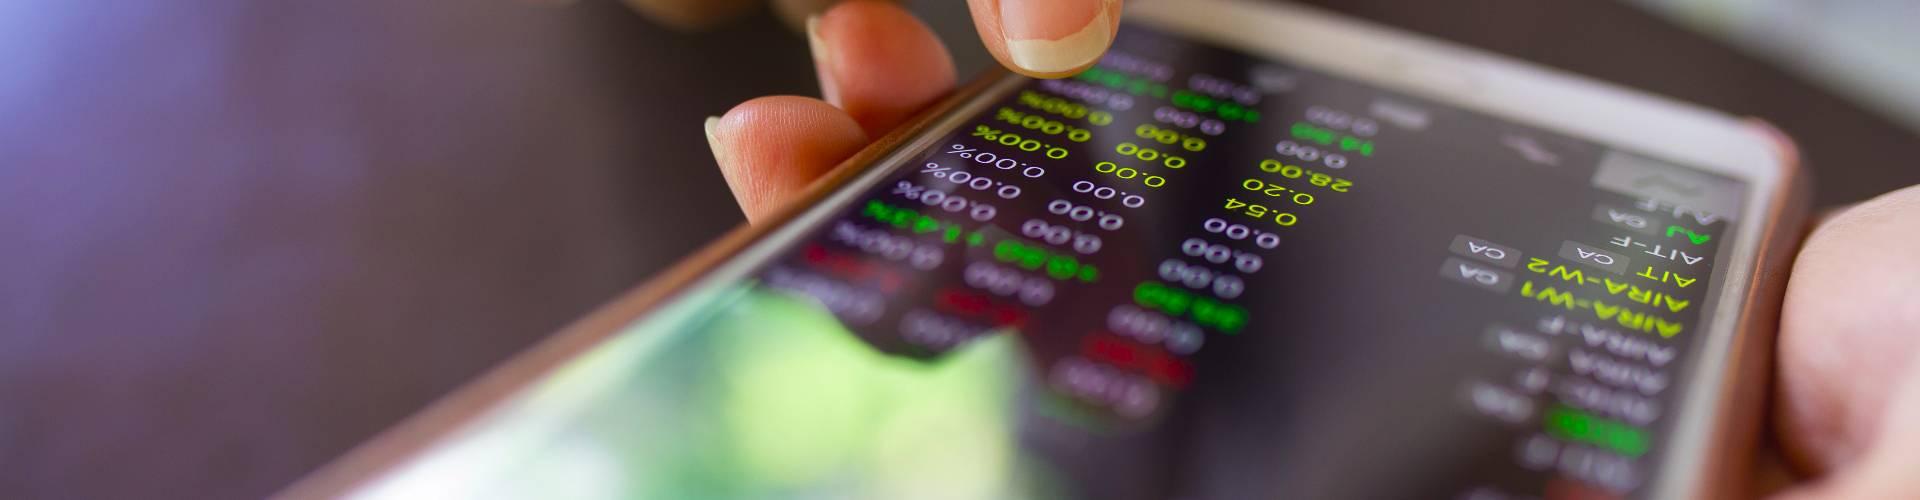 Acoustic attack lets hackers control smartphone sensor